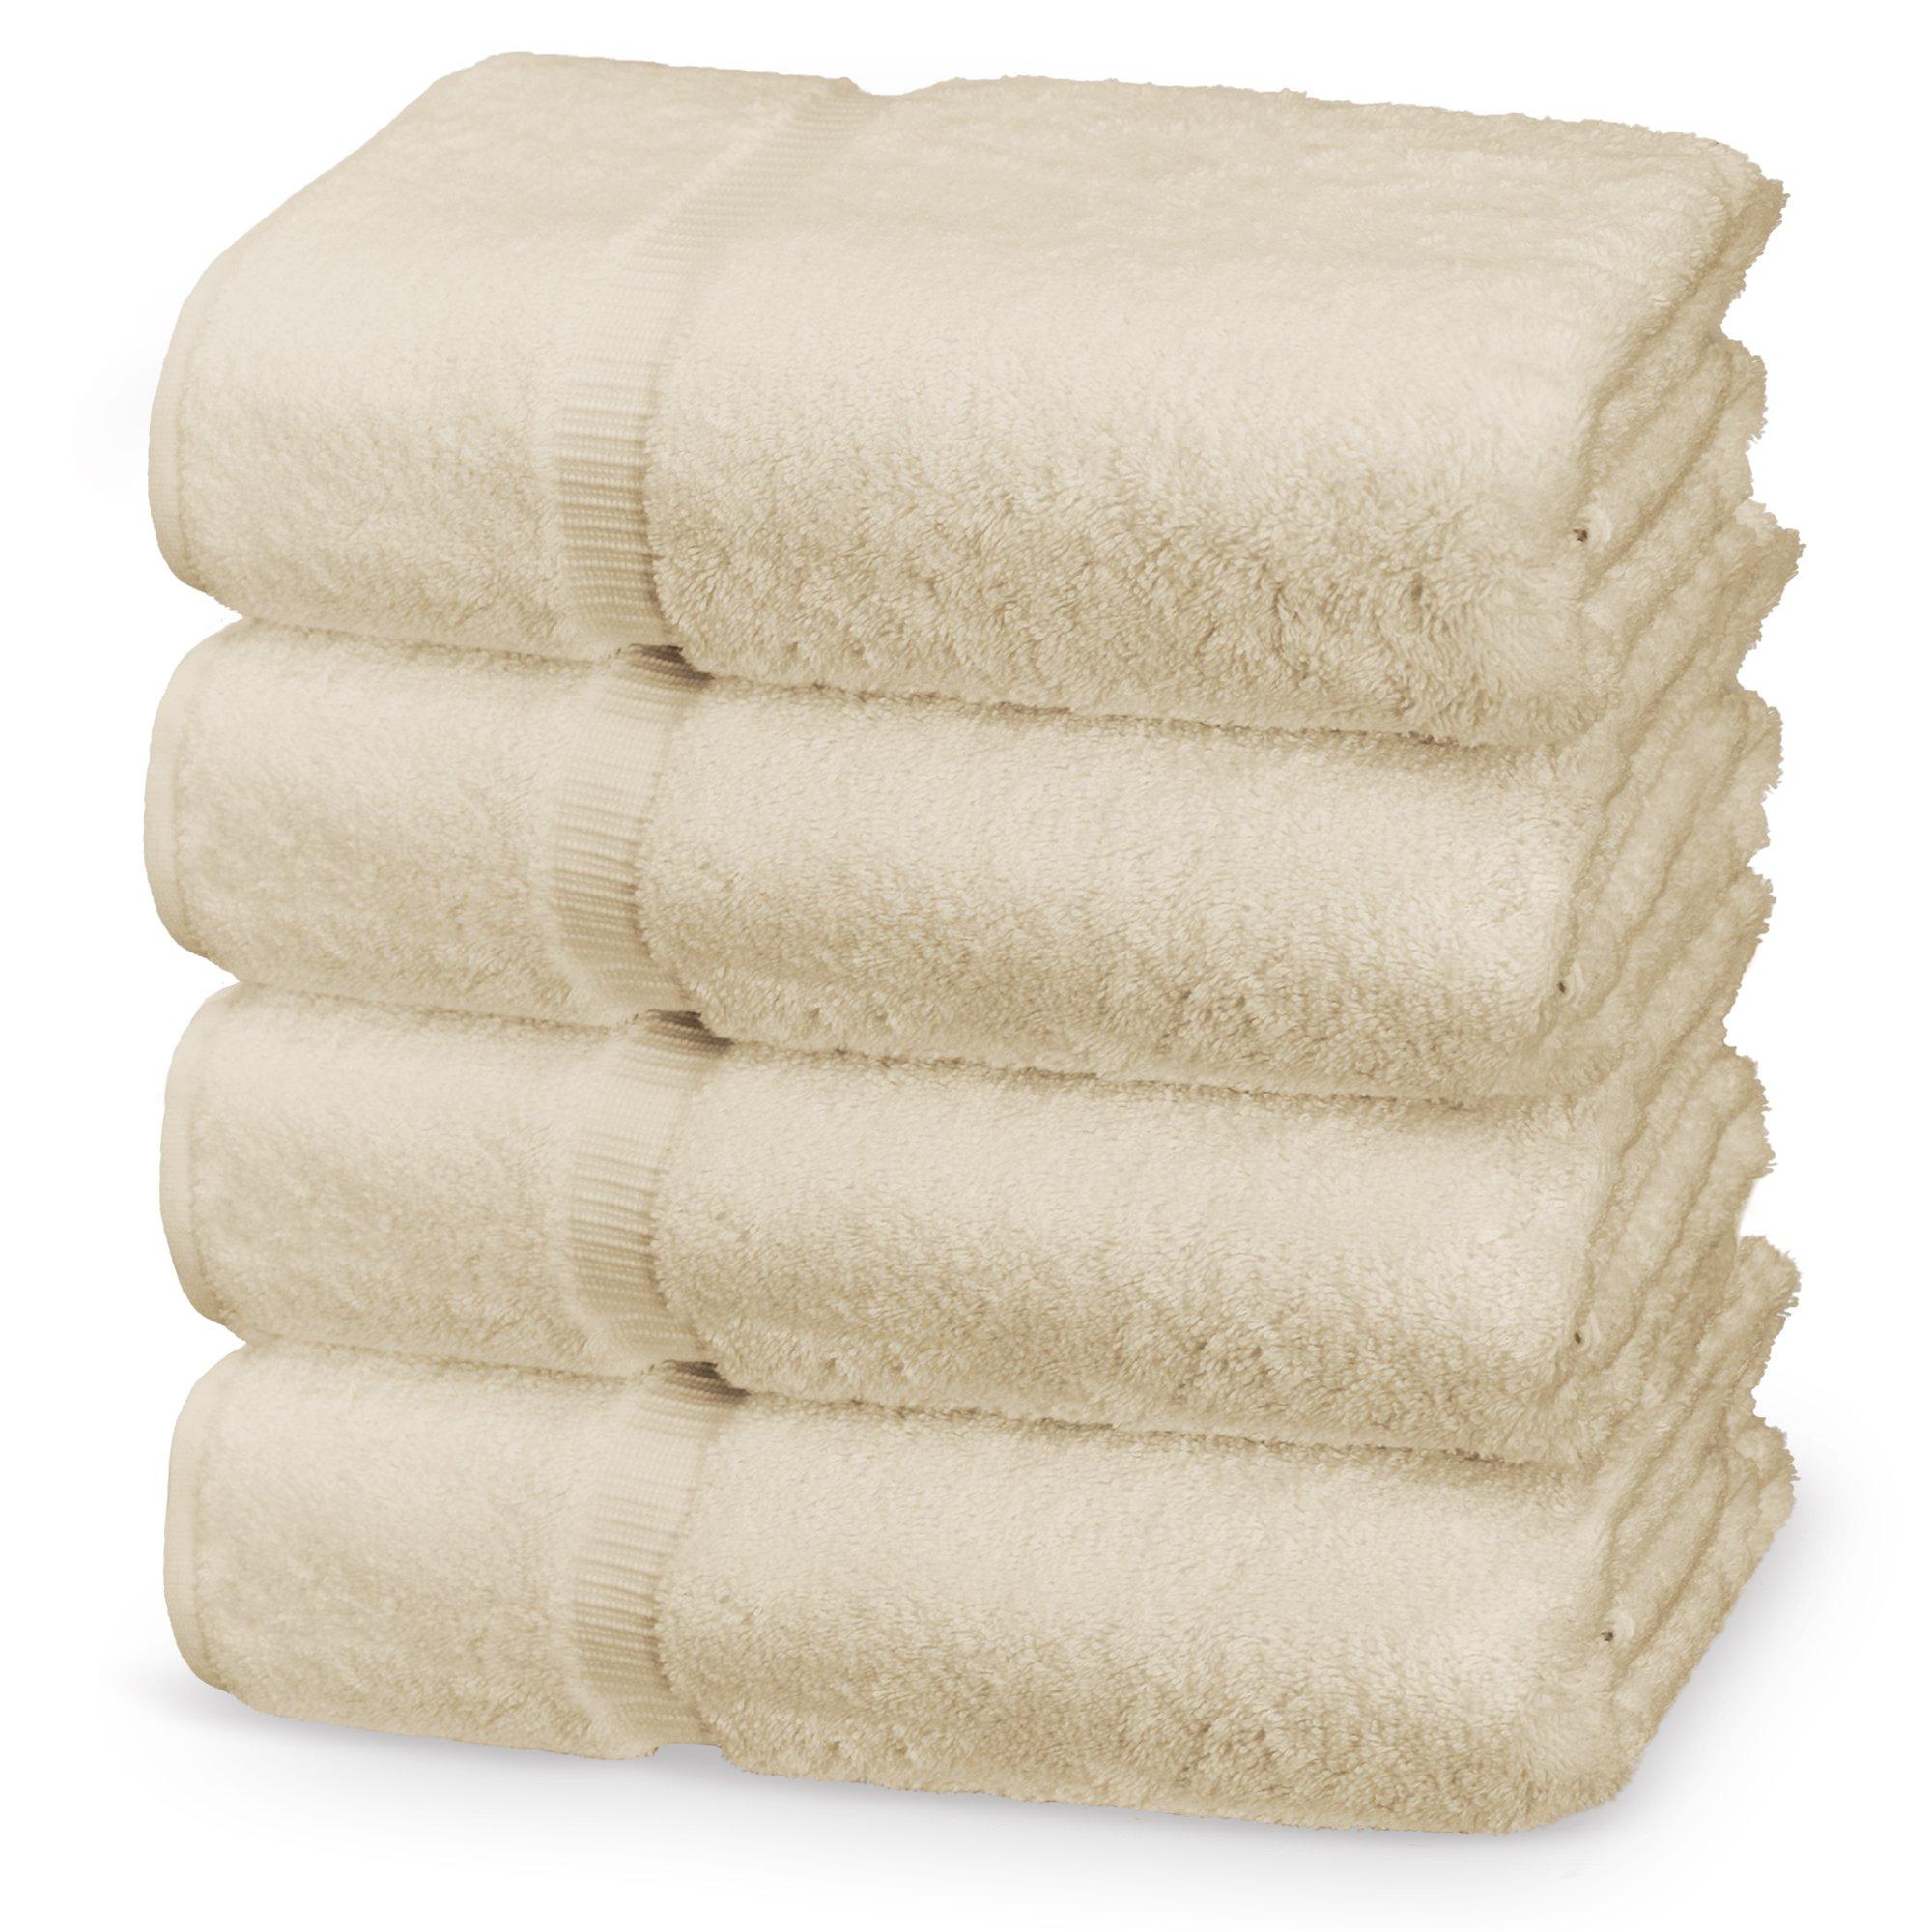 Indulge Linen Dobby Border Towel Sets (Beige, Bath Towels - Set of 4)